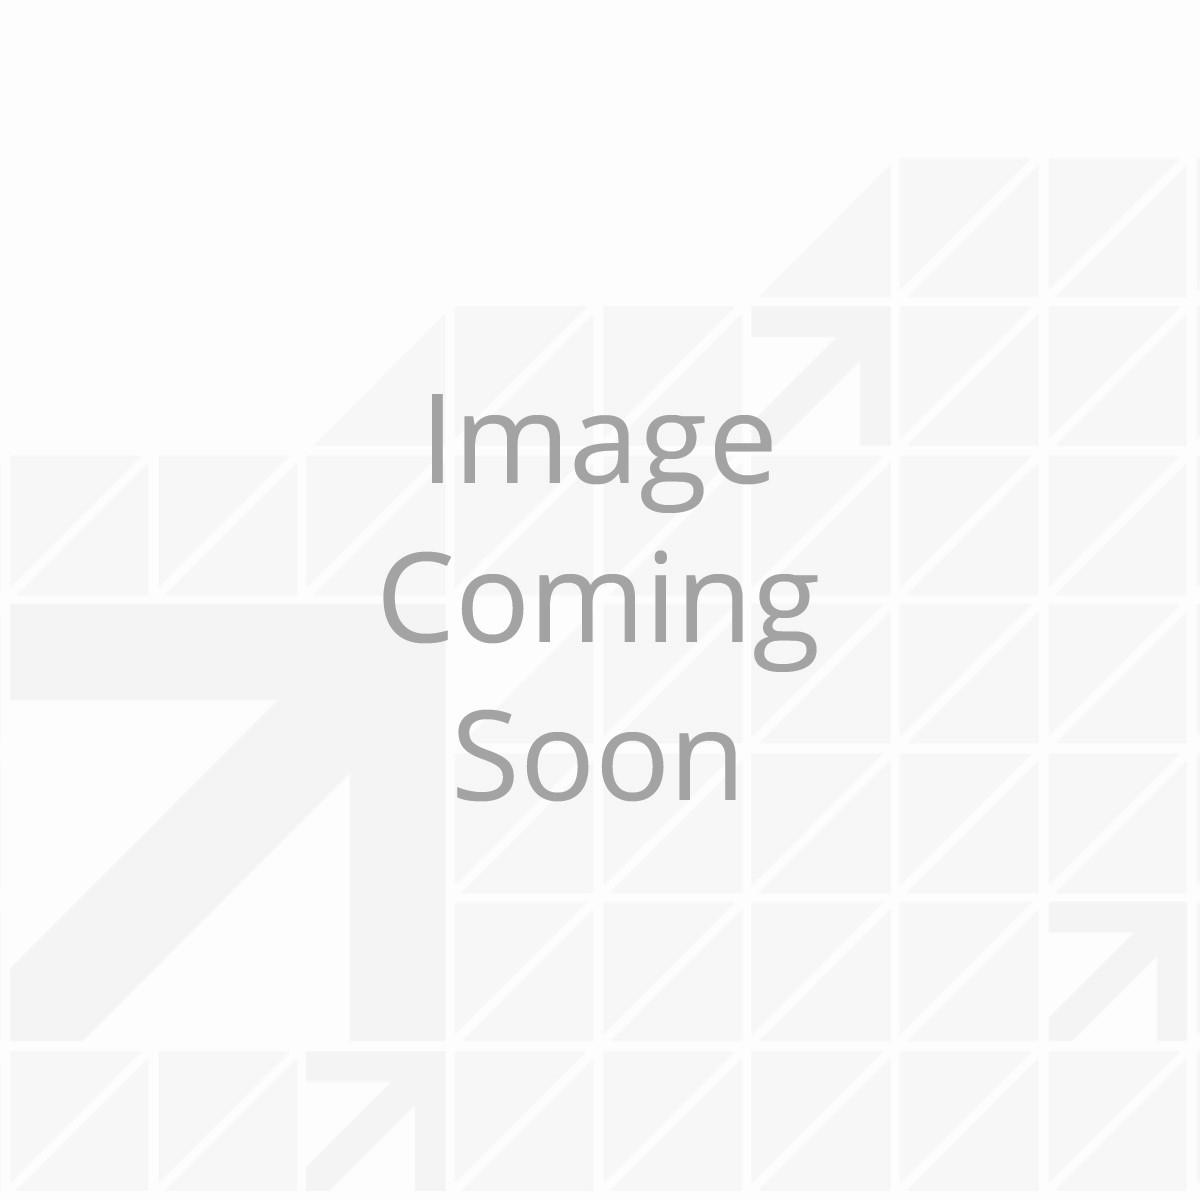 Spyder 5th Wheel Rail Gooseneck Hitch